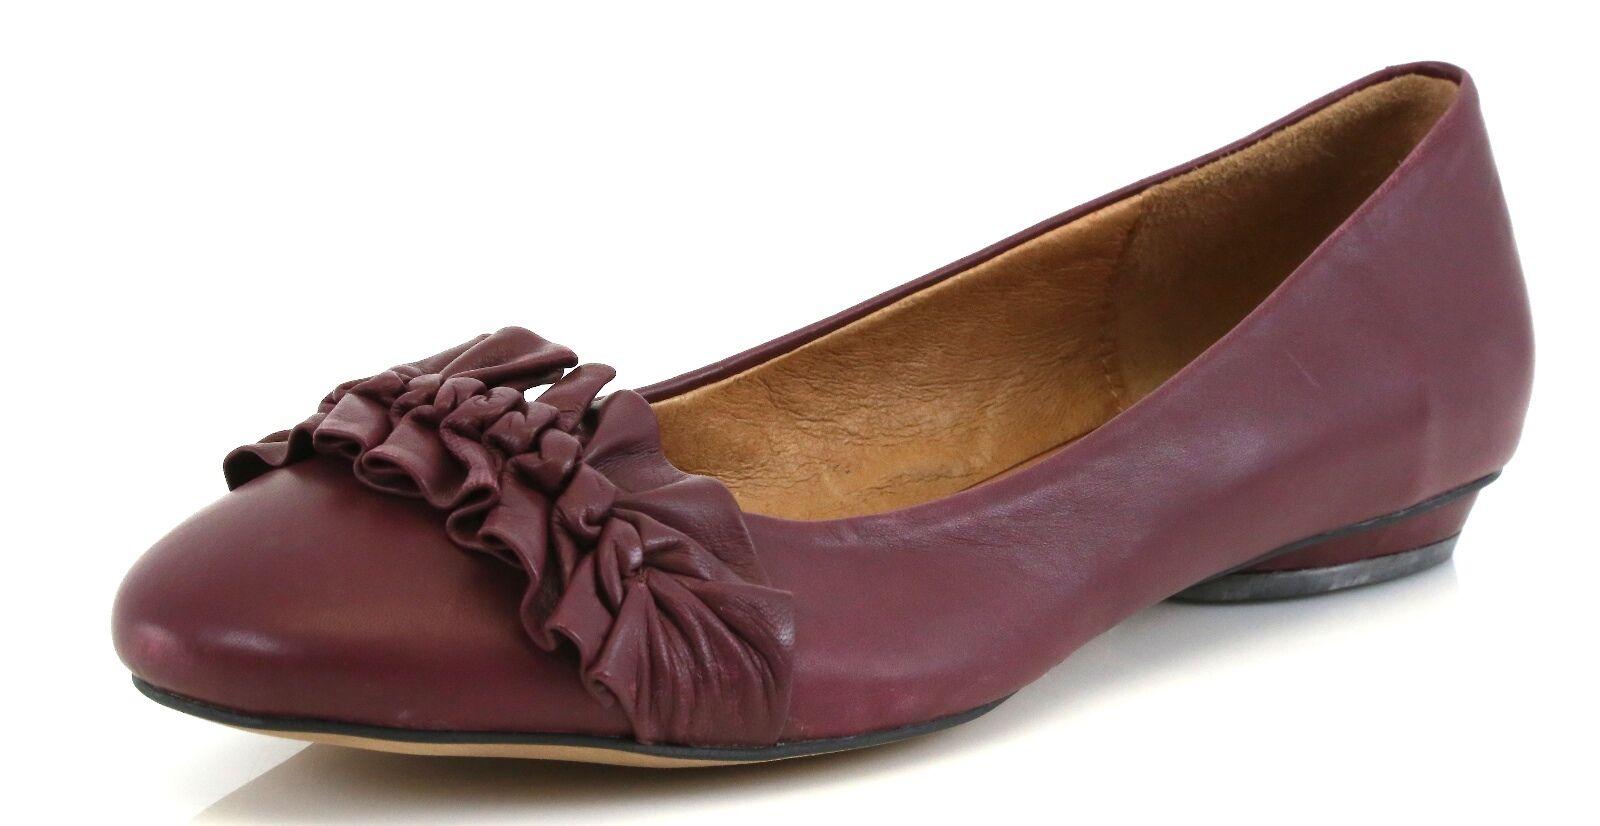 Corso Como FAIRBANKS Burgundy Leather Ballet Flats 7086 Size 9.5 M NEW!